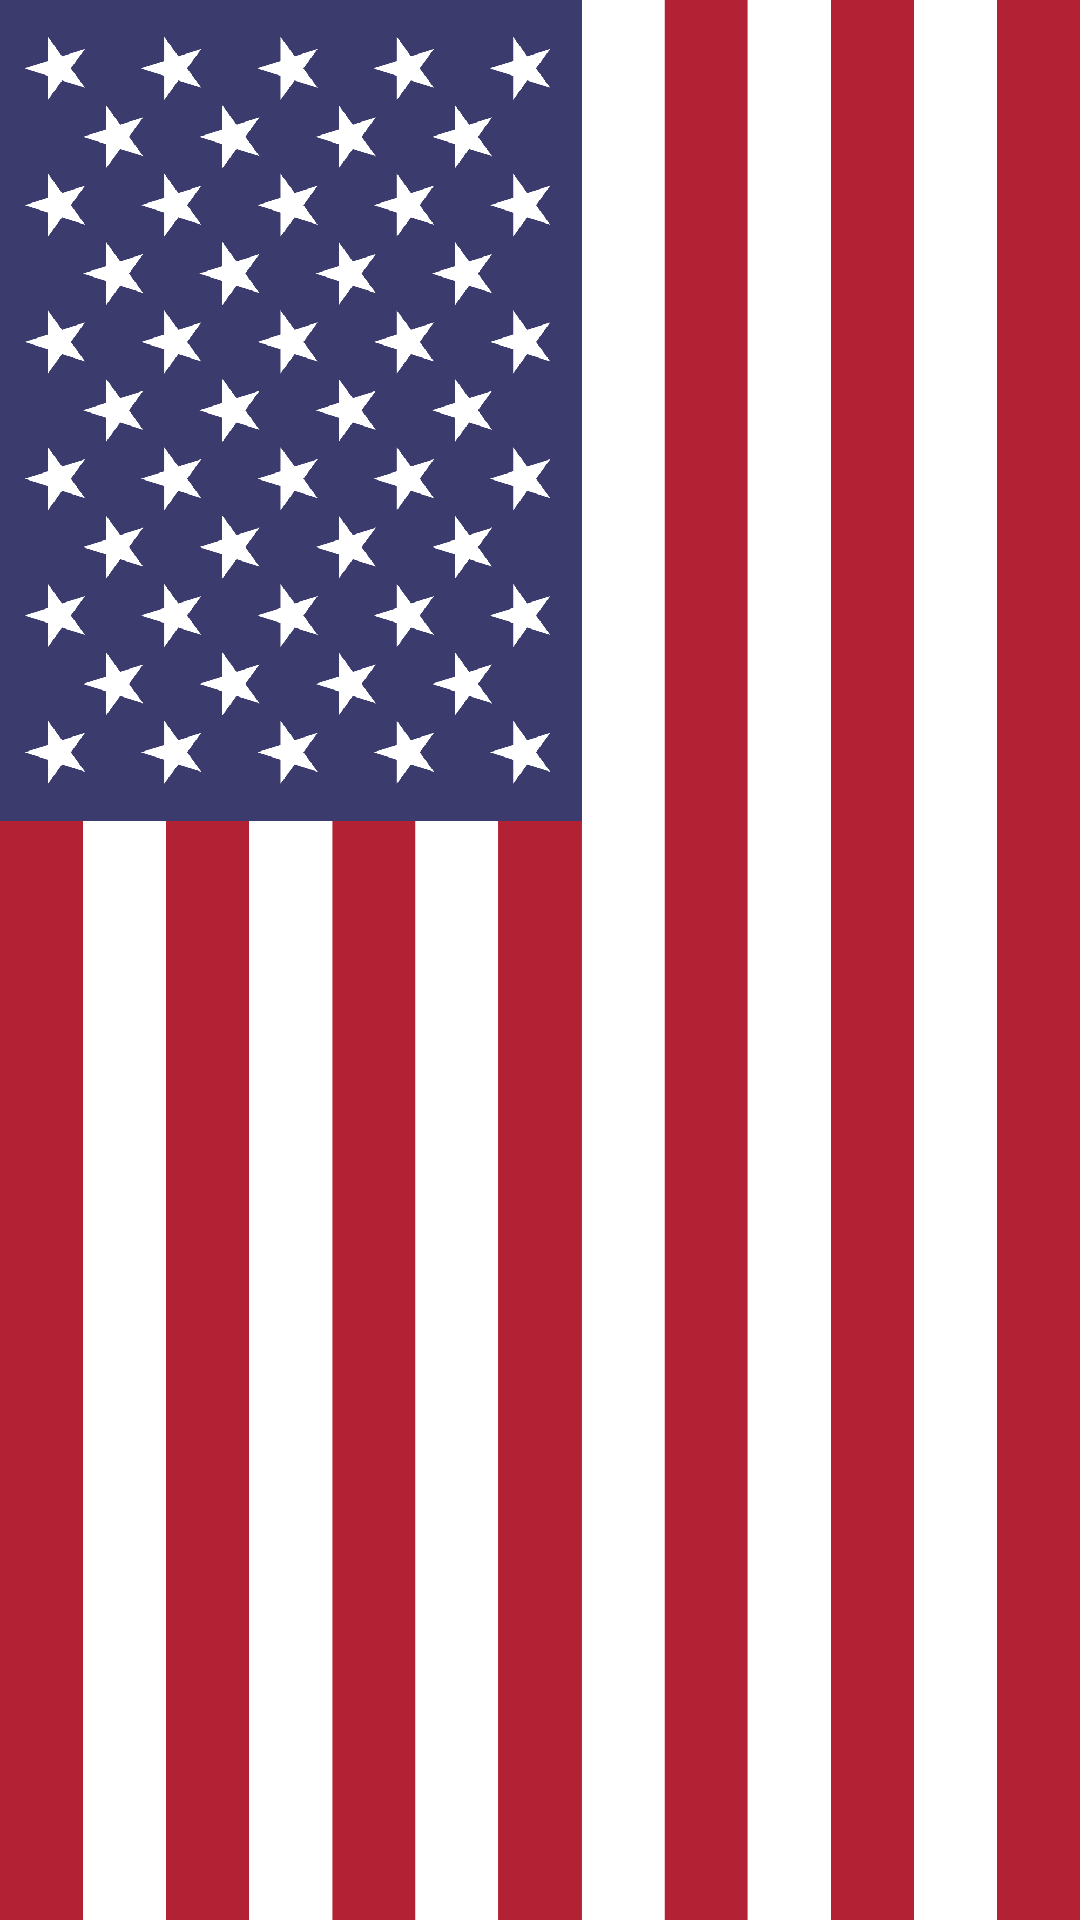 American Flag Iphone Wallpaper Free Download American Flag Wallpaper Usa Flag Wallpaper Usa Wallpaper